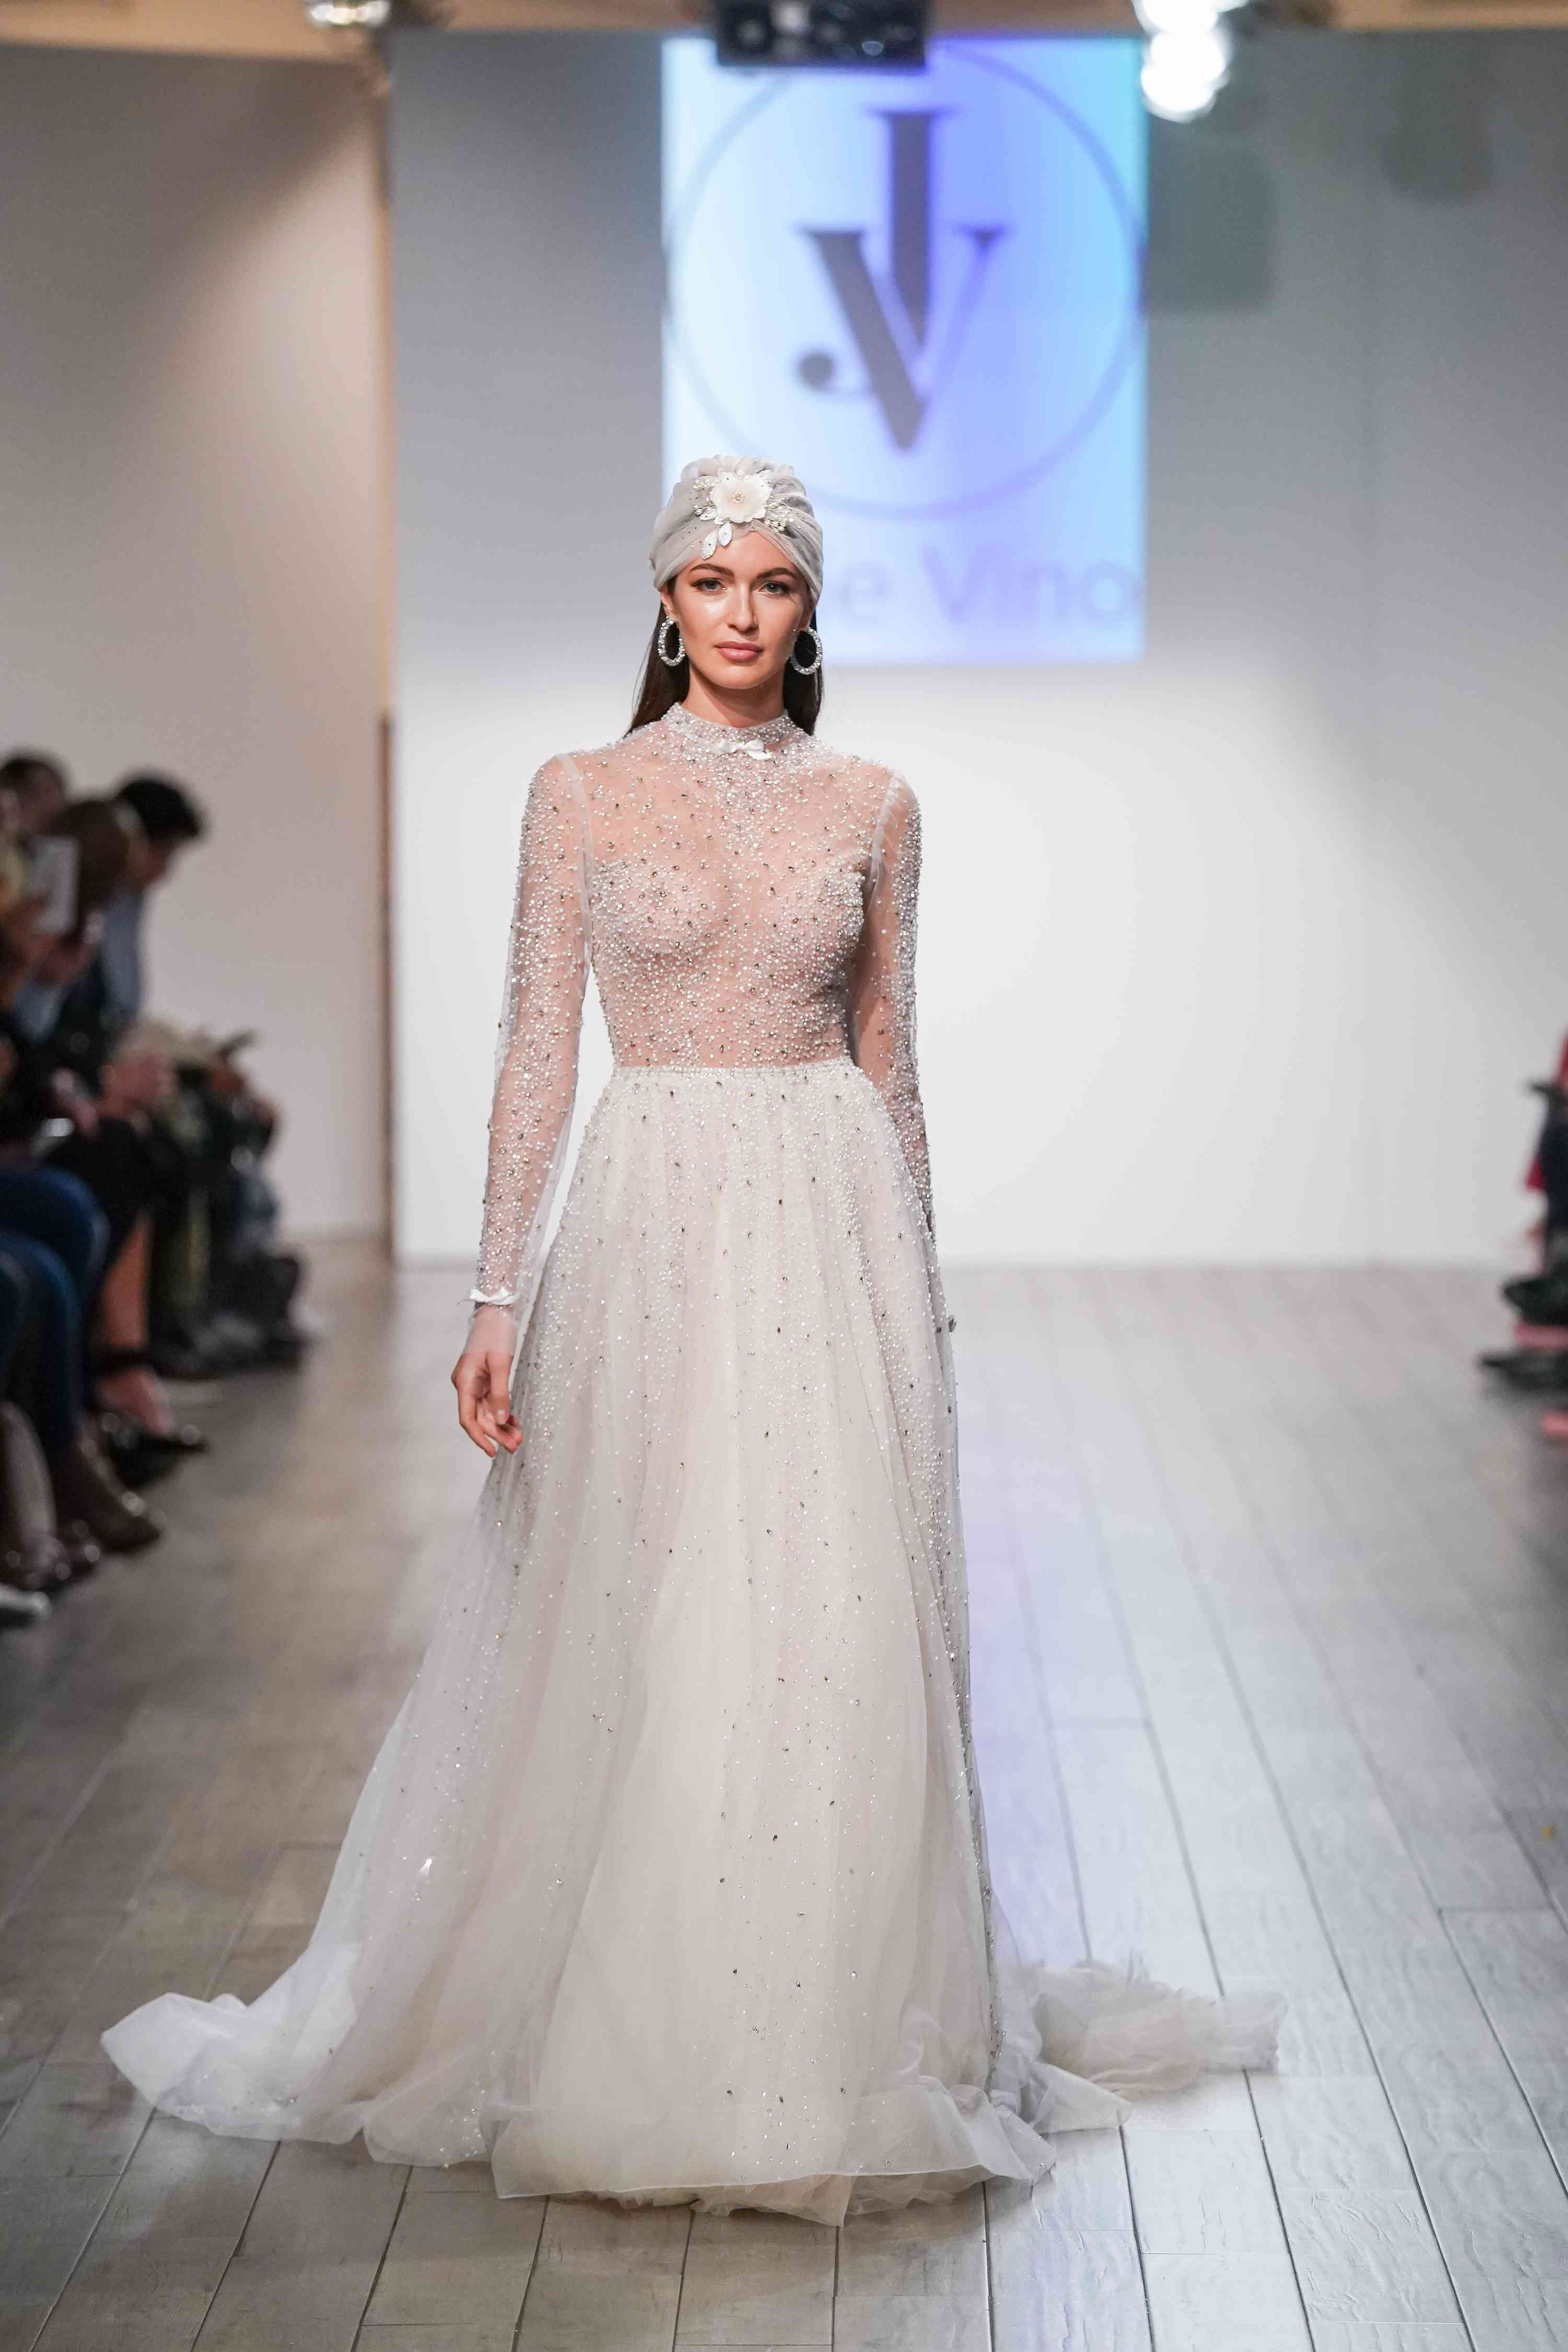 Model in high neck long sleeve wedding dress